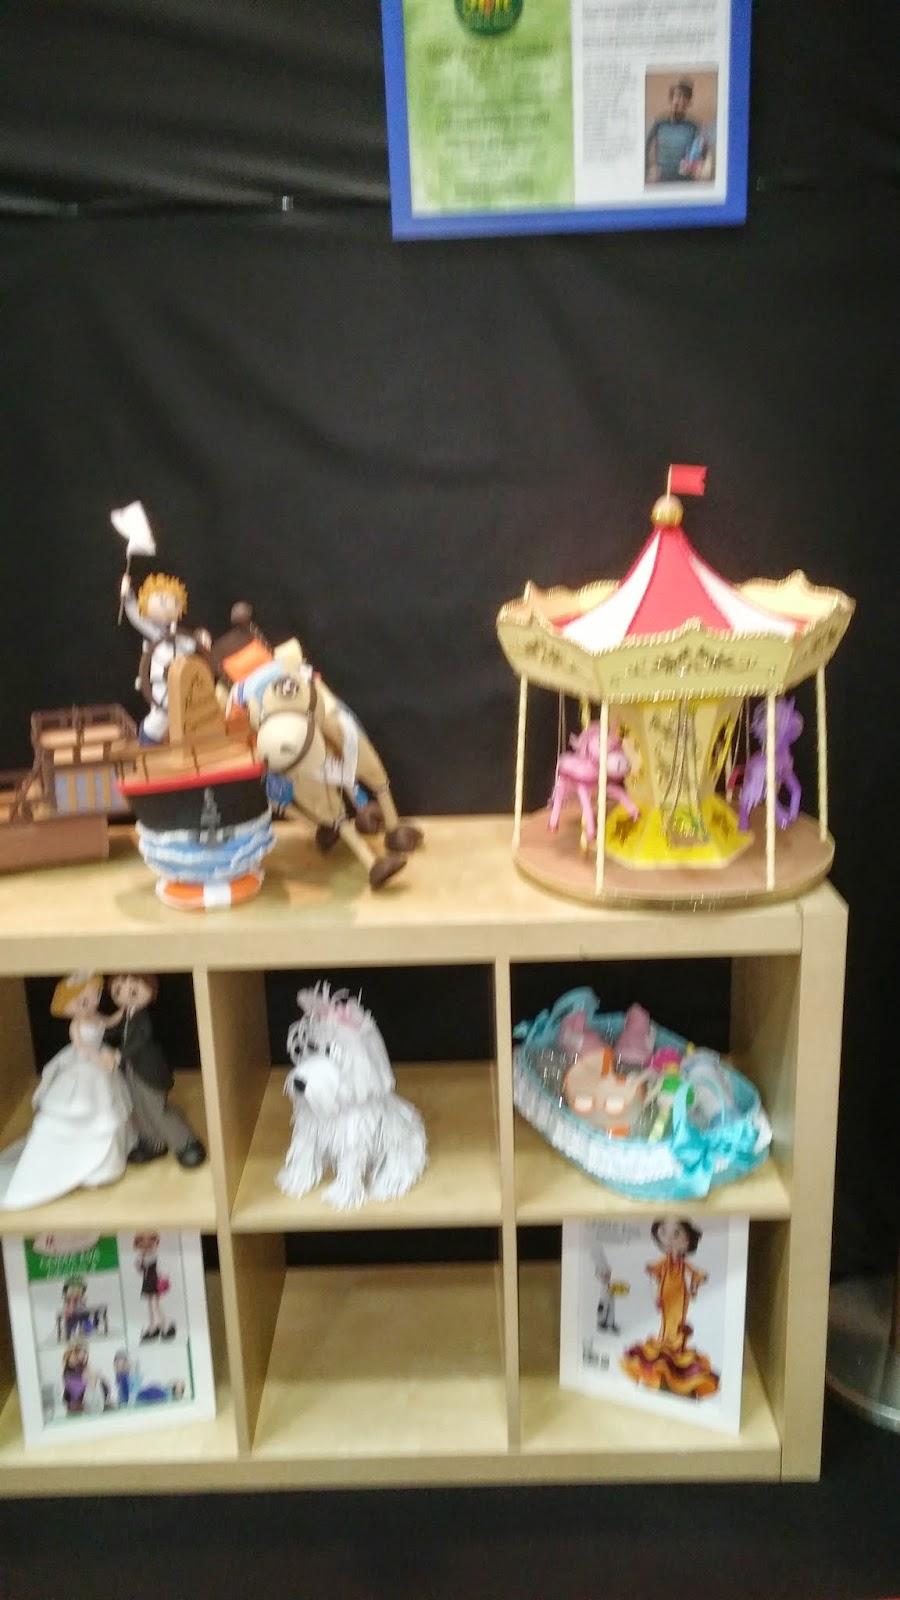 Carrusel, perro, barco y caballo fofuchas